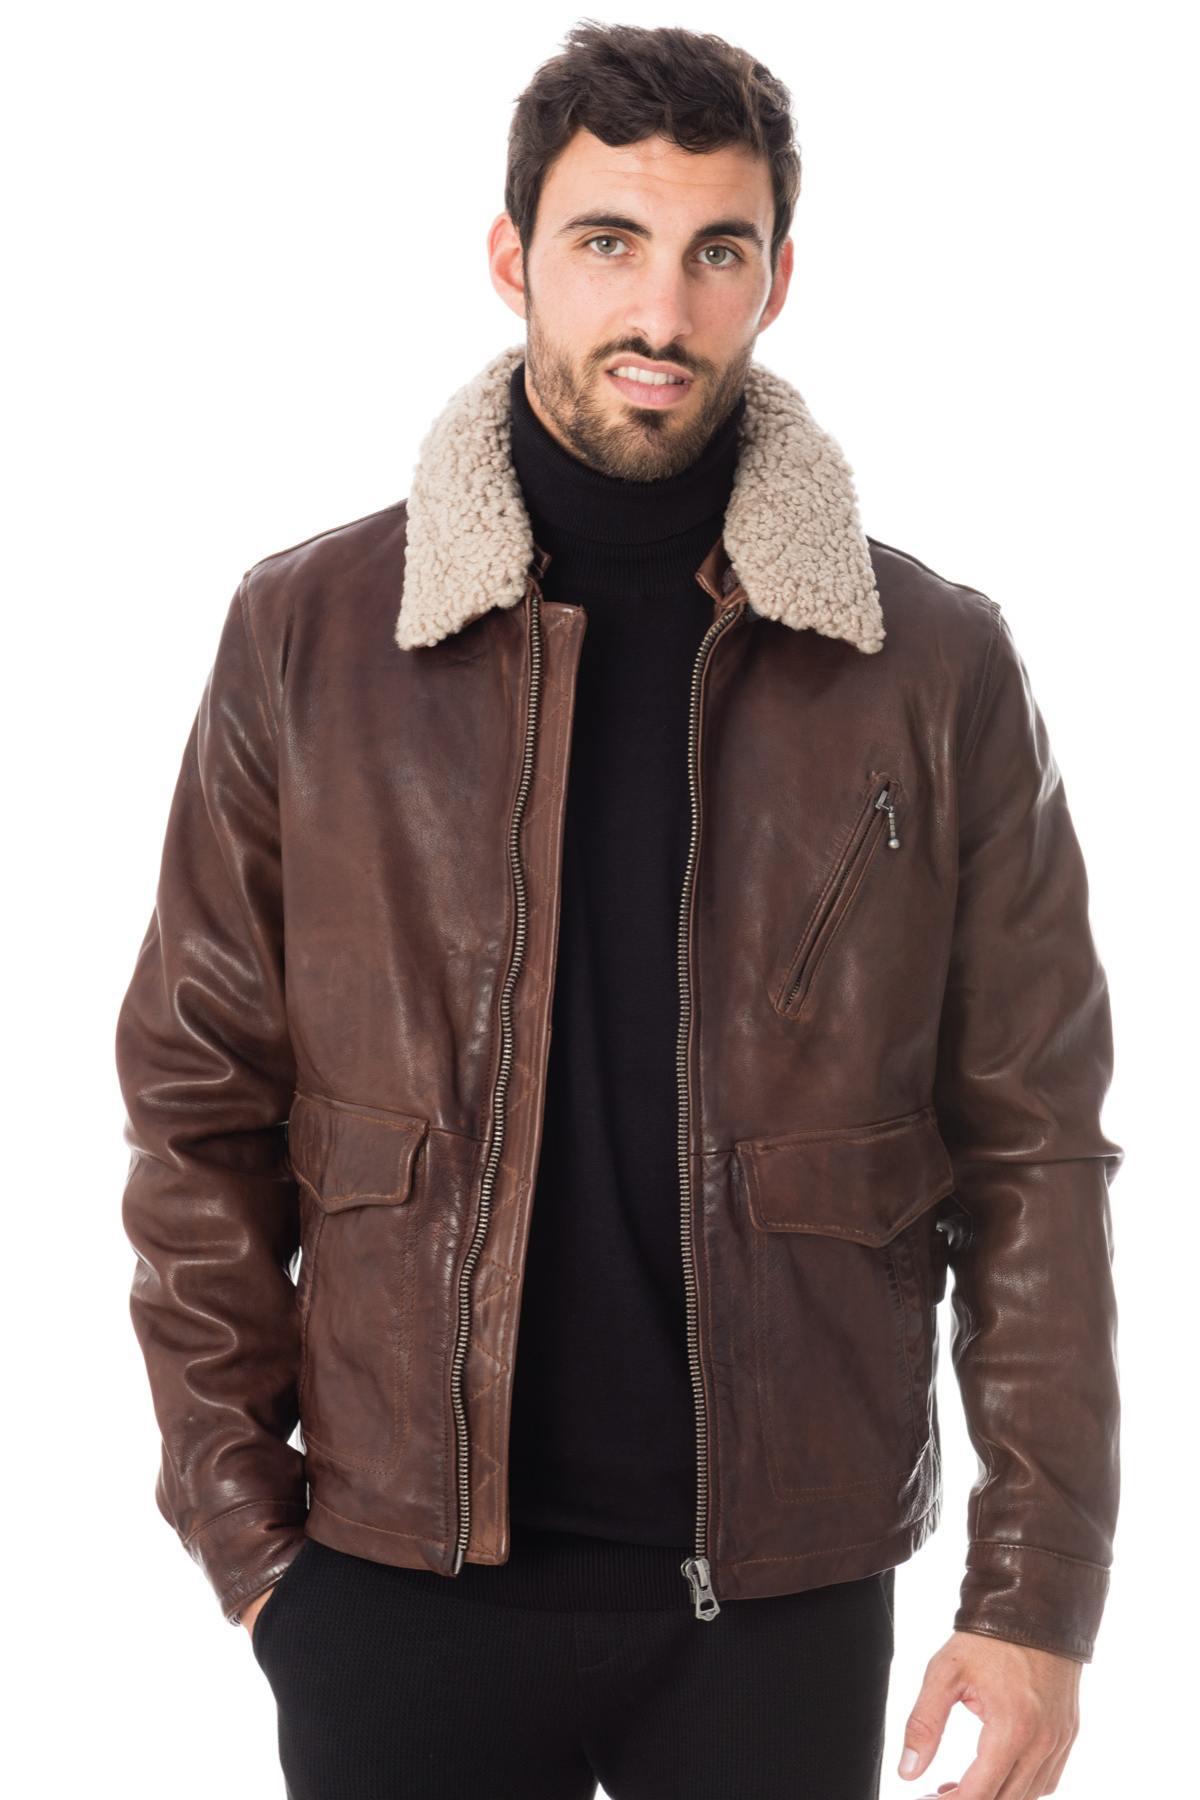 shades of outlet hot sale online Blouson Homme Daytona BENTLEY SHEEP RACER BISON - Cuir-city.com –  spécialiste du cuir